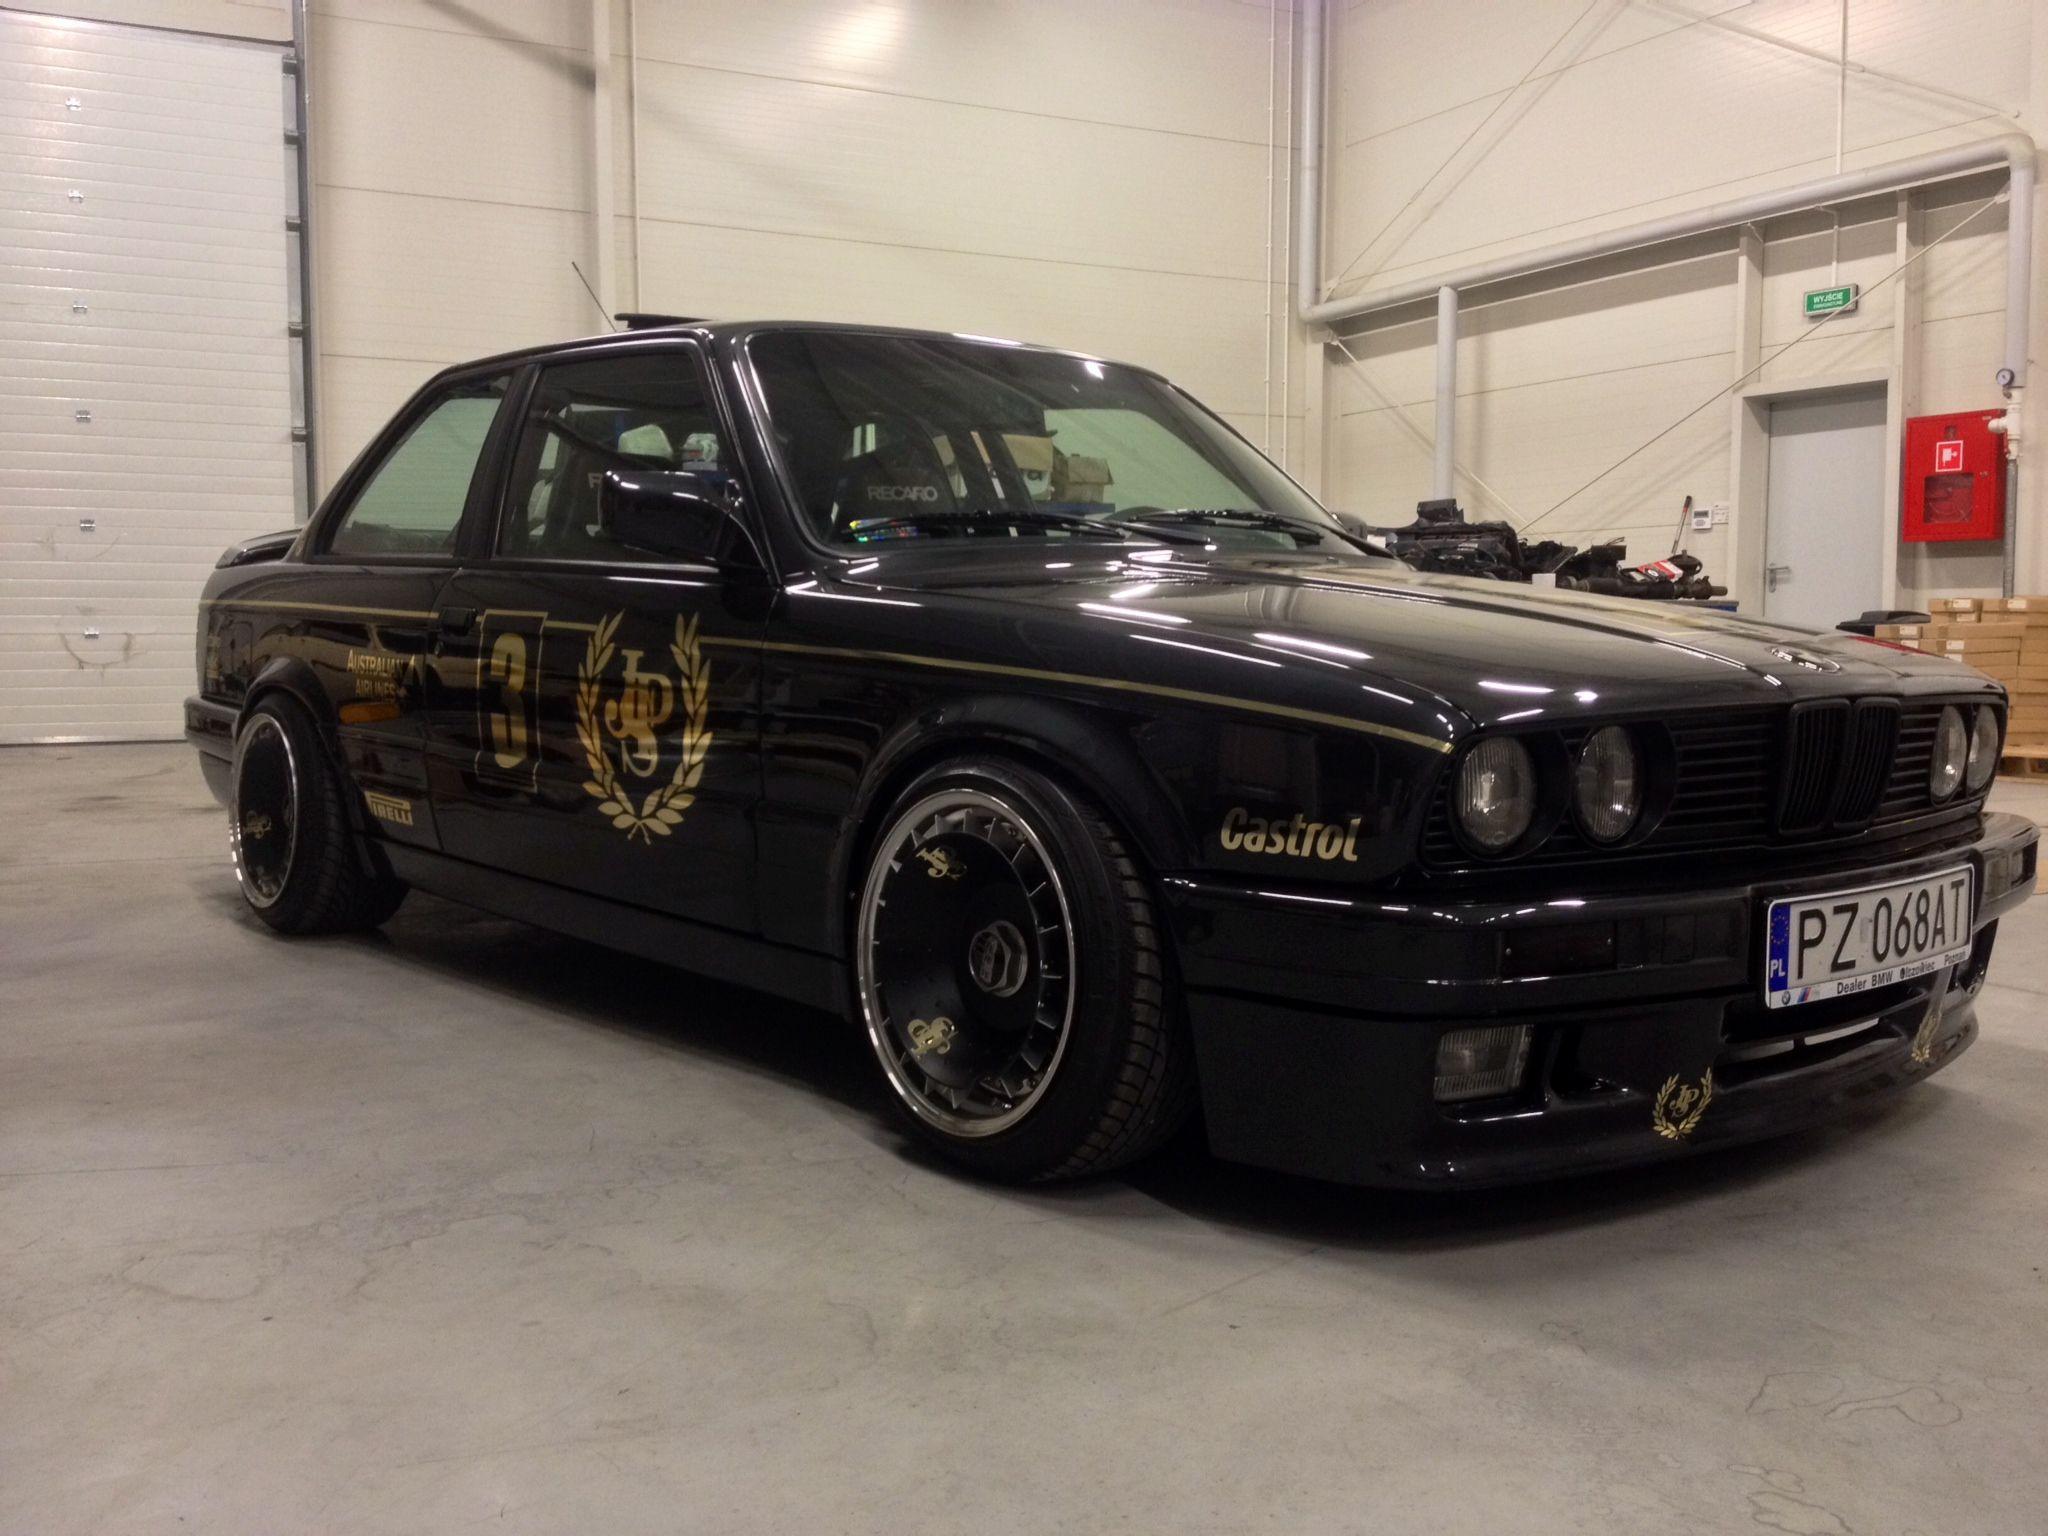 Jps Bmw E30 M3 Black Bbs Wheels E30 1083398 Hd Wallpaper Backgrounds Download